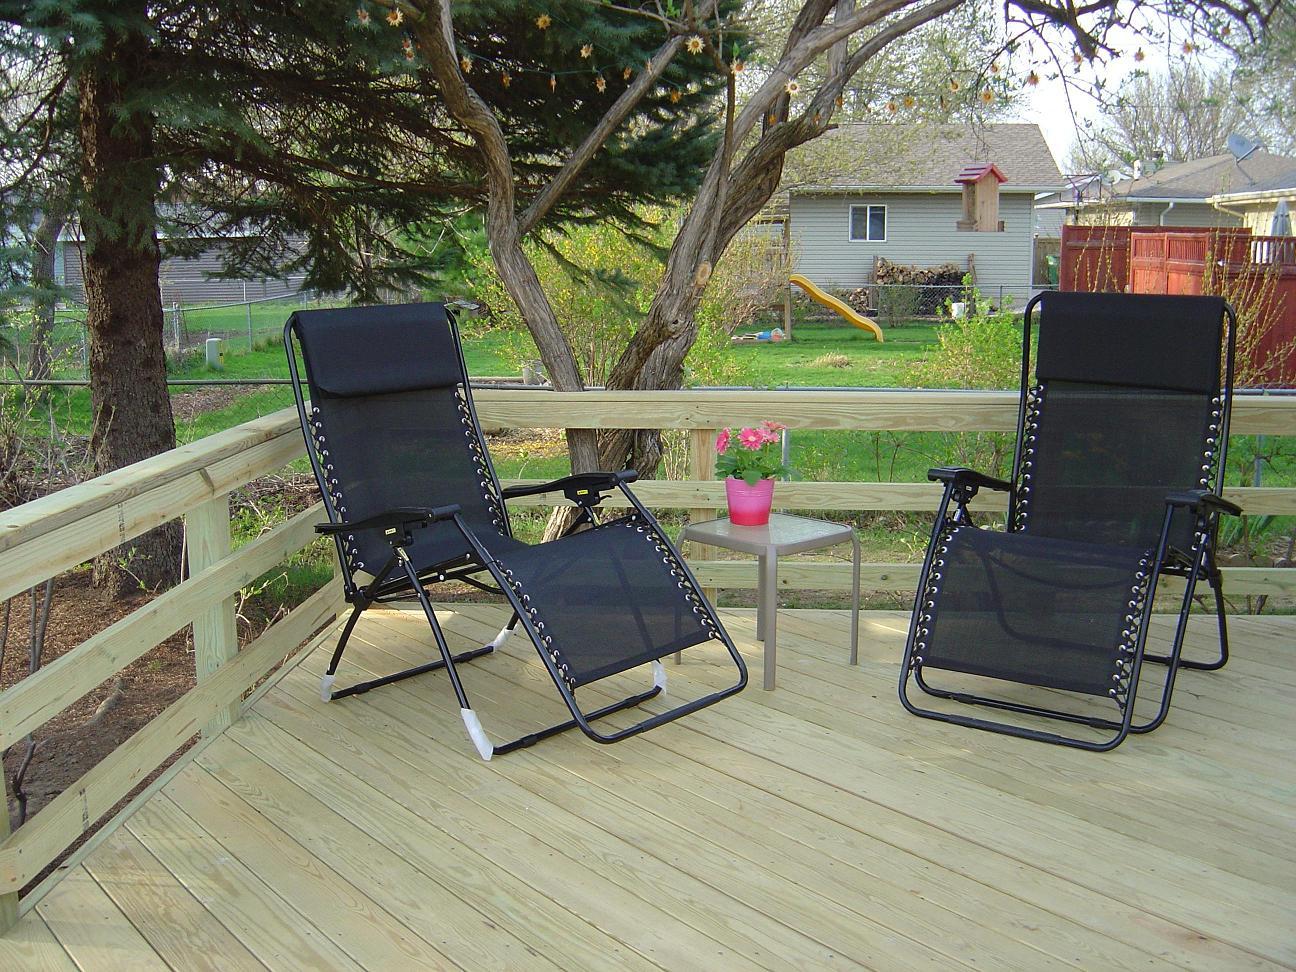 sofas by design des moines ashley furniture hogan mocha sofa patio obsidiansmaze